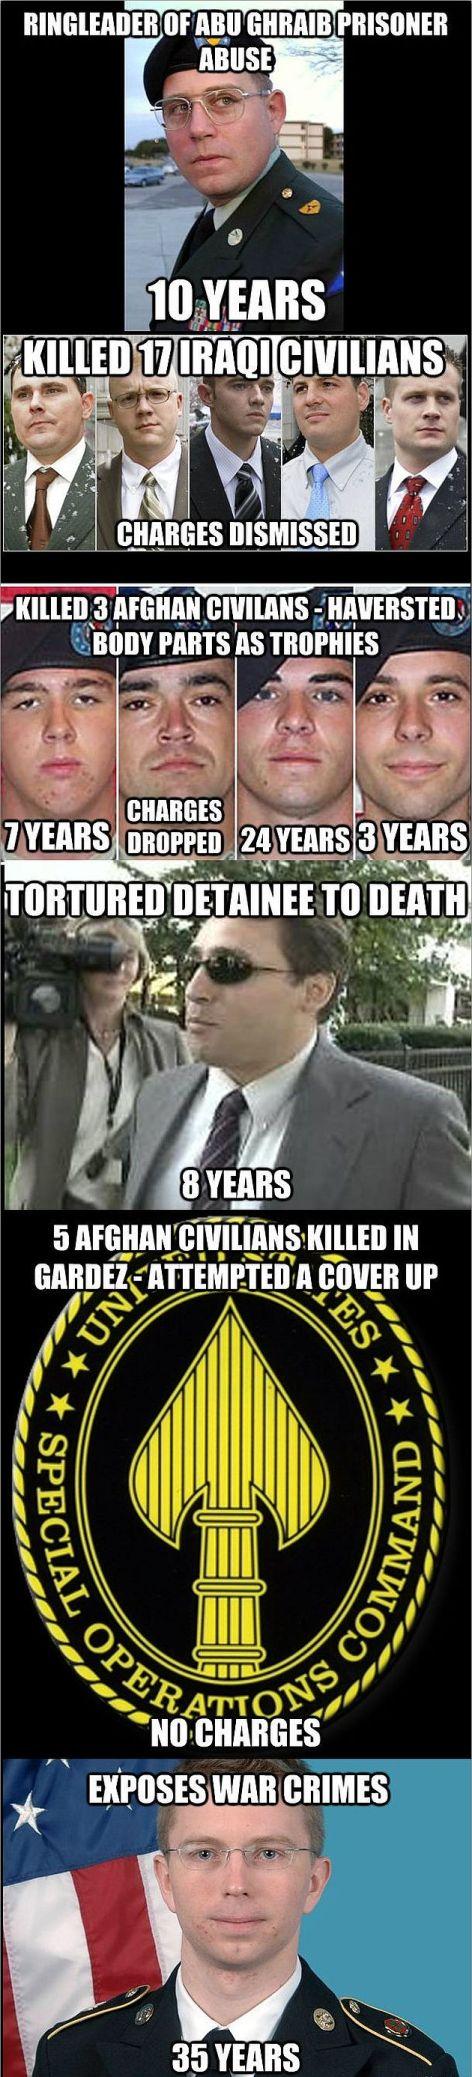 Ringleader Of Abu Ghraib Prison Abuse